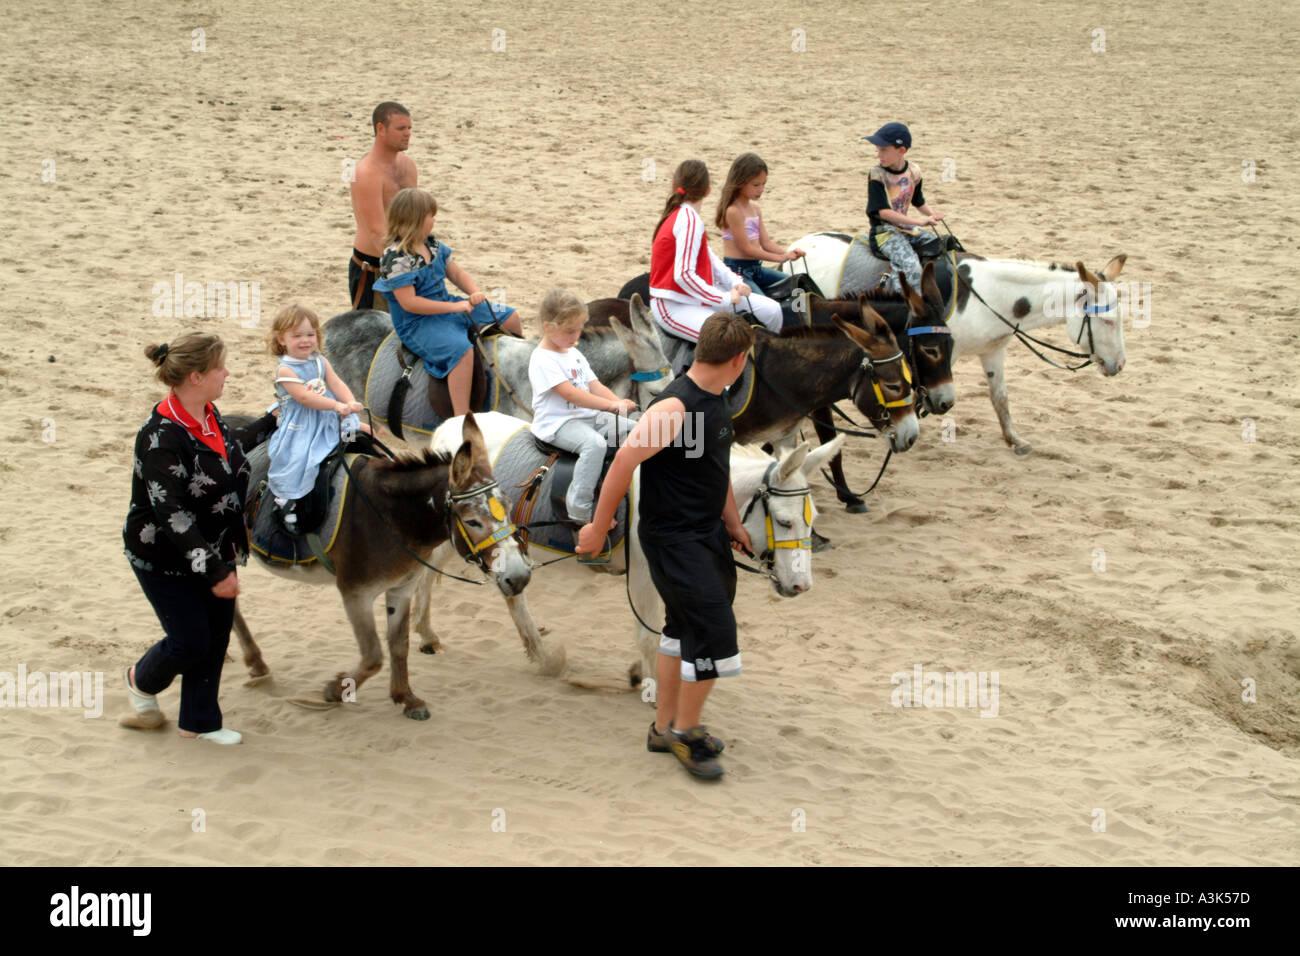 Donkey Rides on the beach at Weston Super Mare England UK Stock Photo